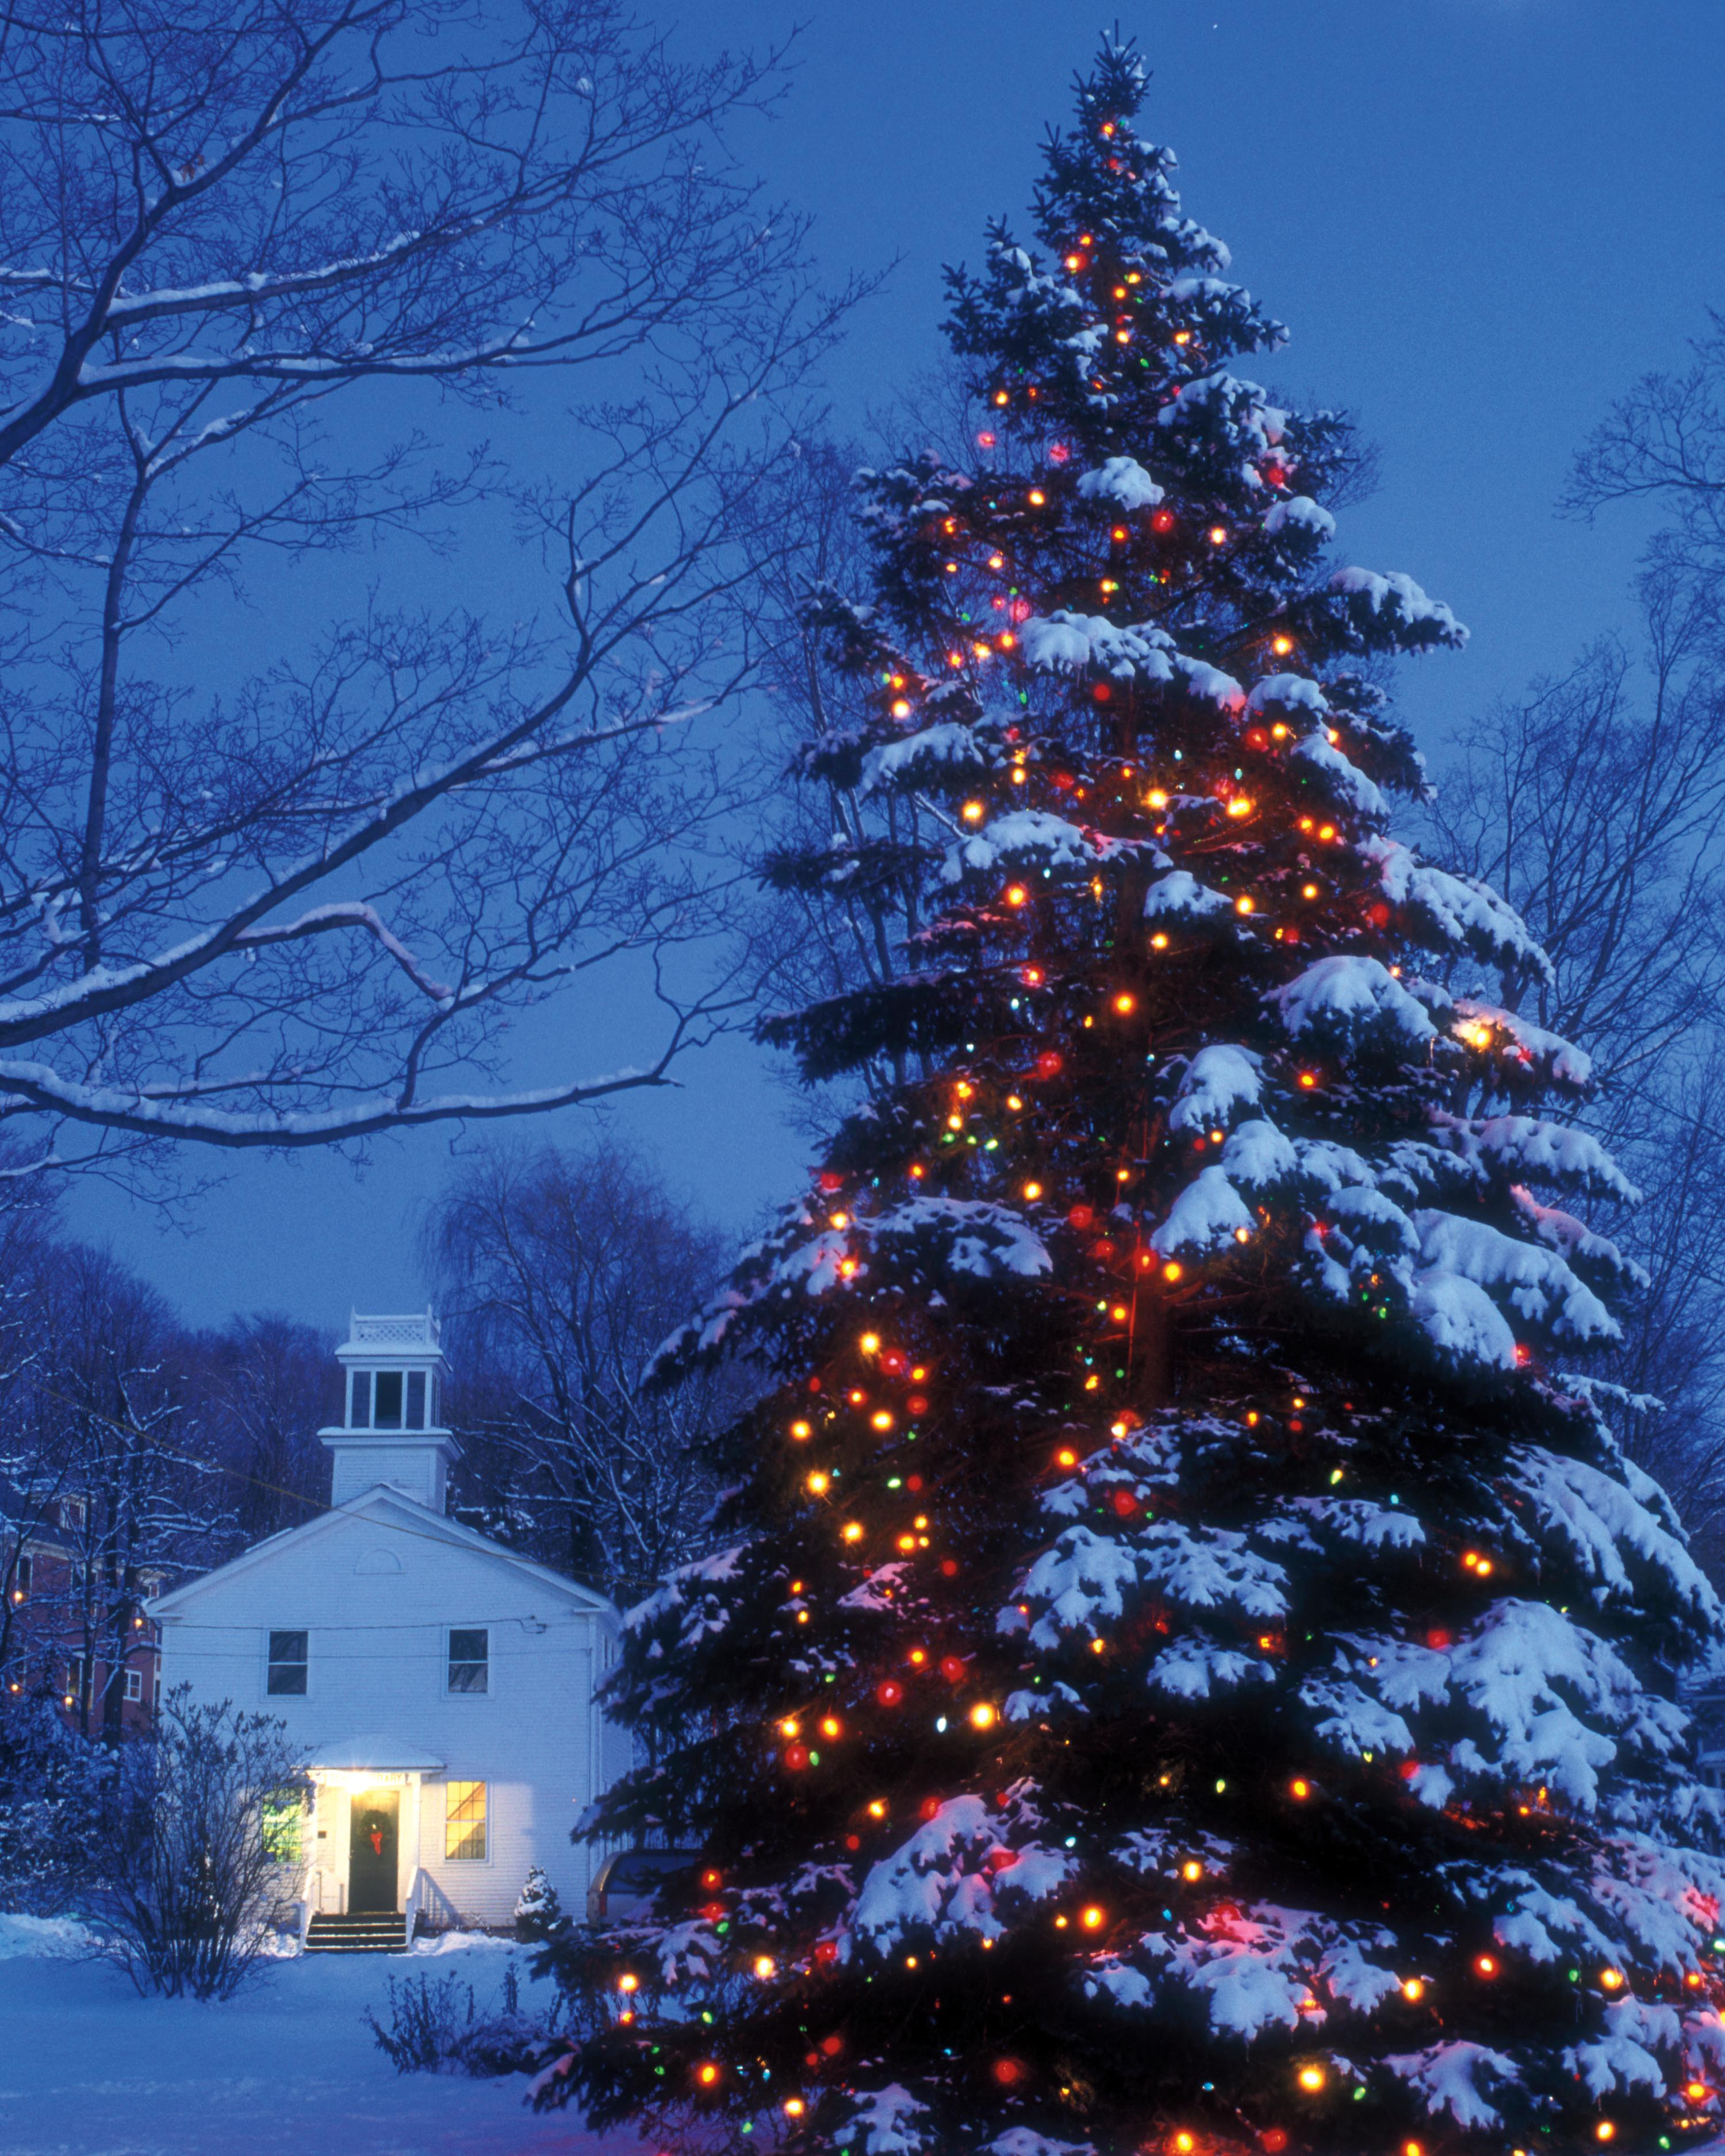 large-outdoor-christmas-tree-lights-s111579-a6e2e0.jpg